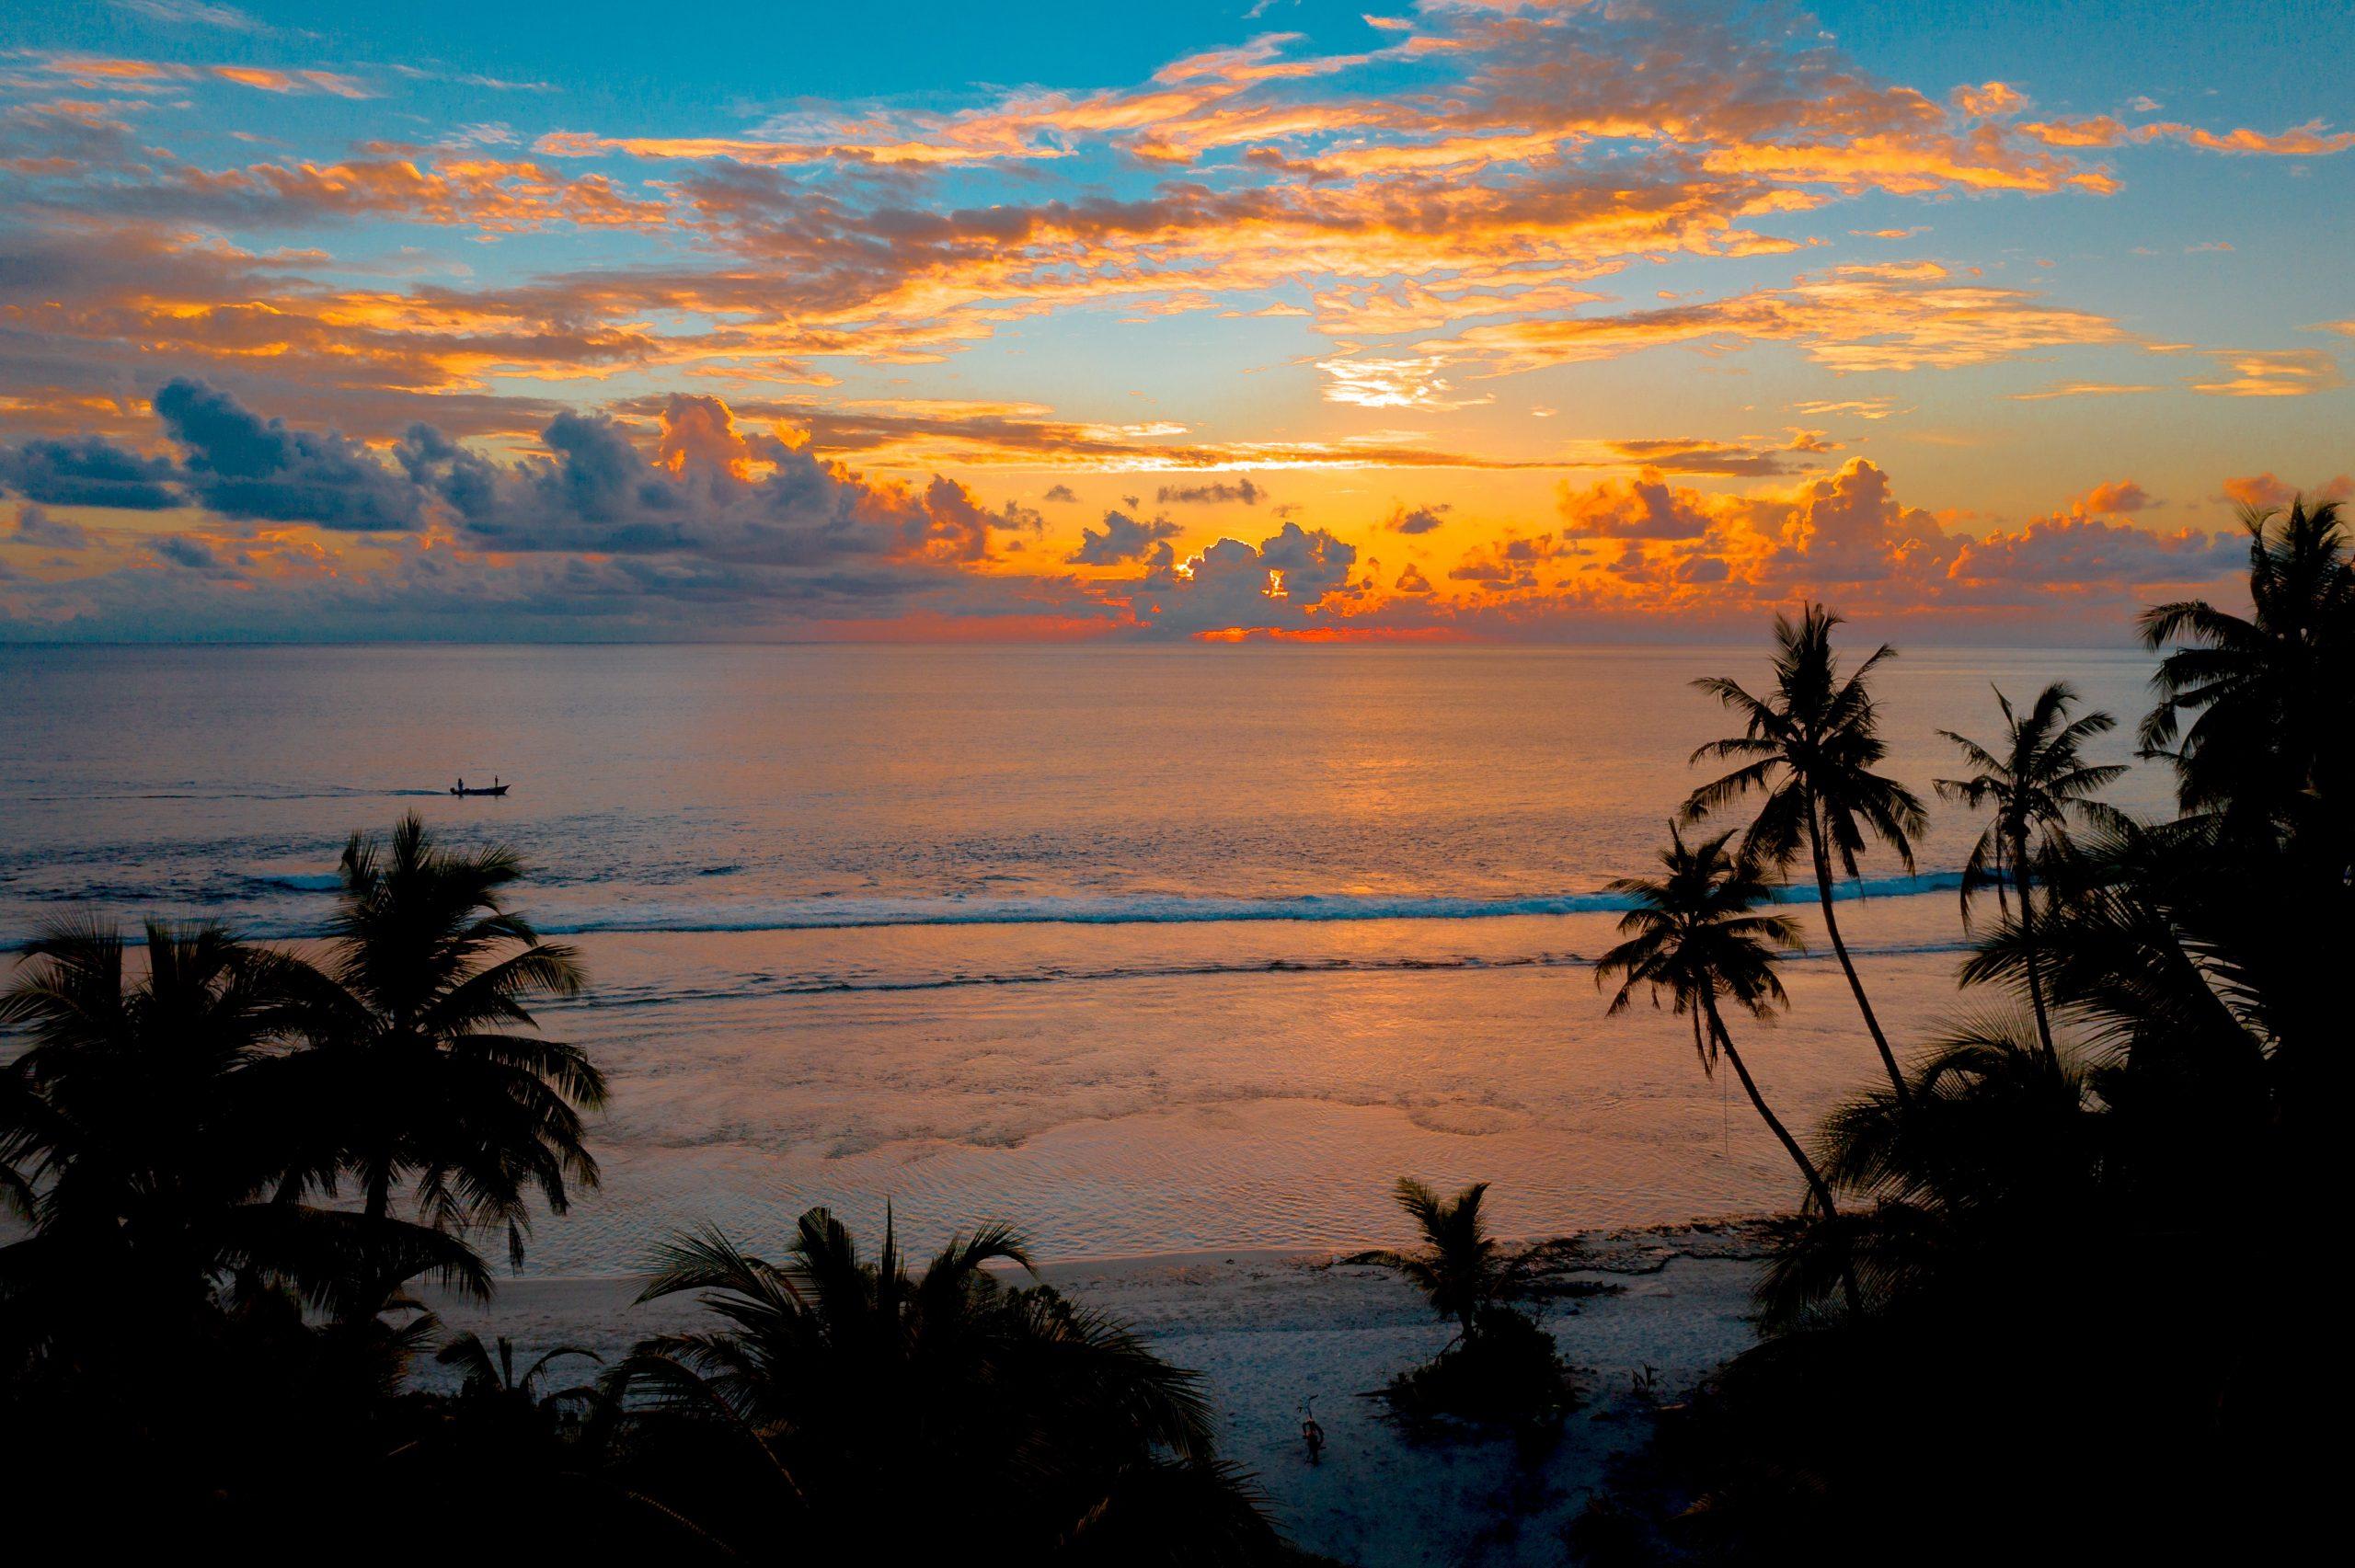 Sessions sunrise et sunset